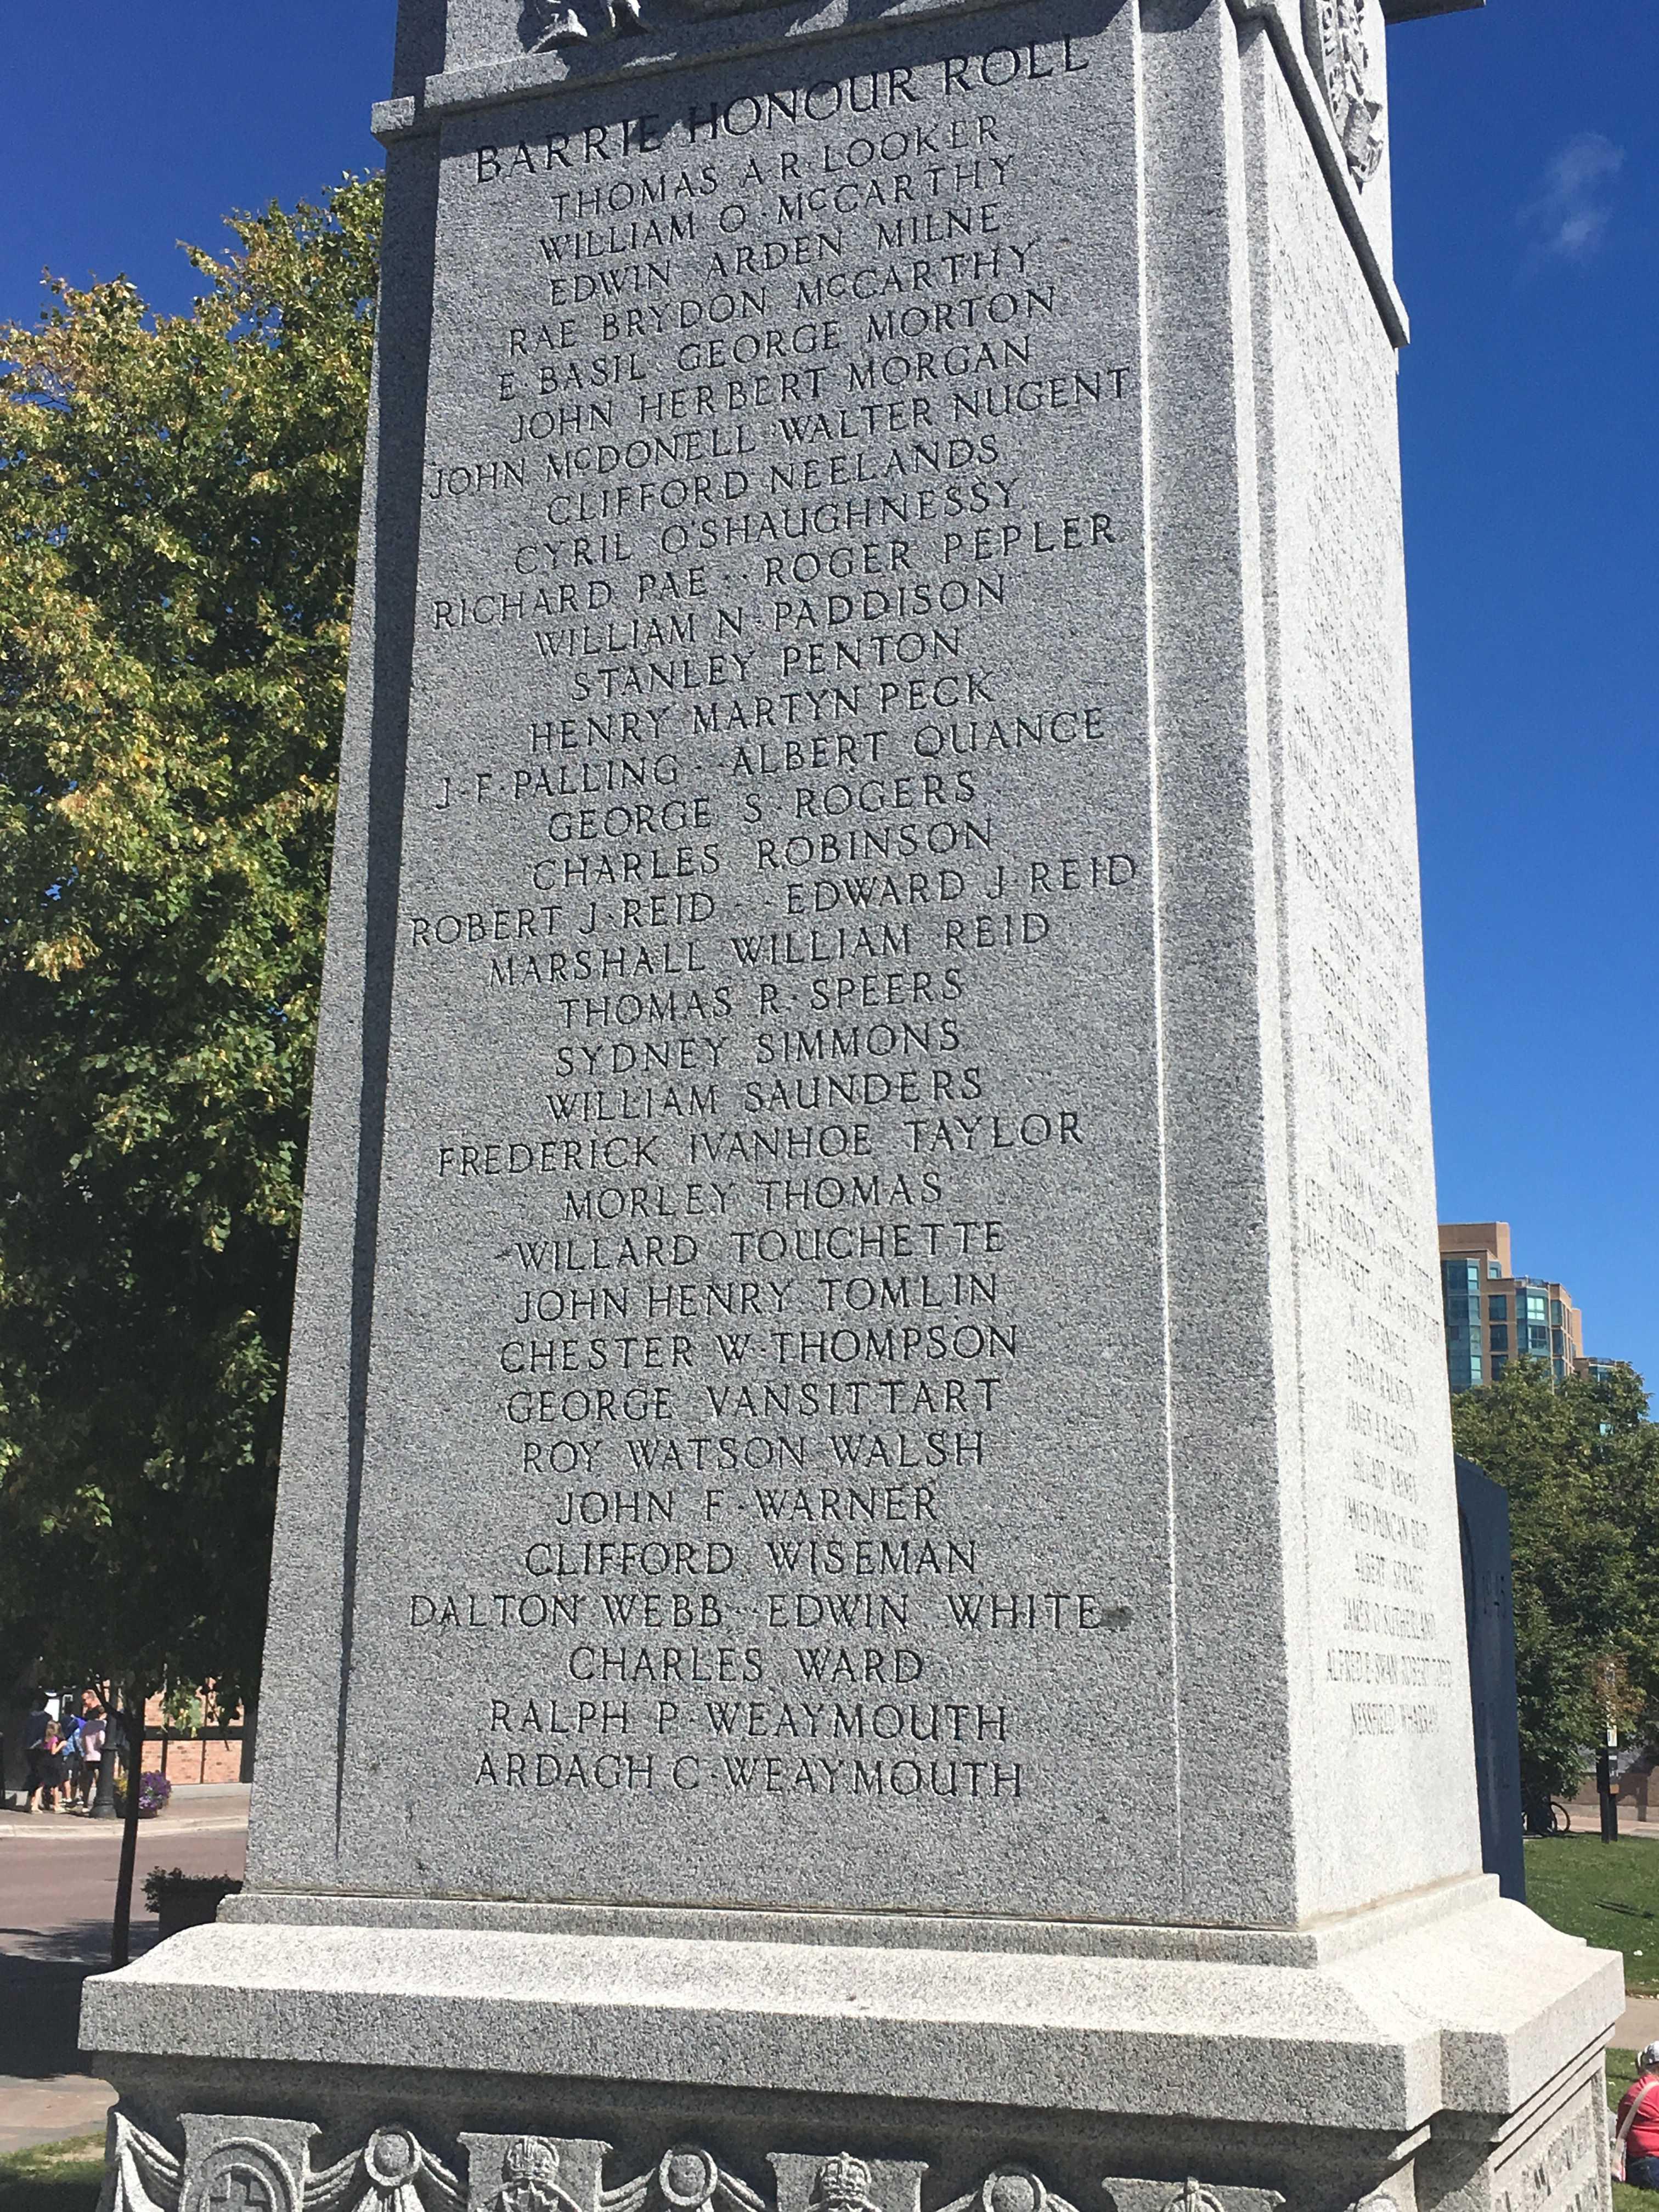 Mémorial – Barrie, Ontario